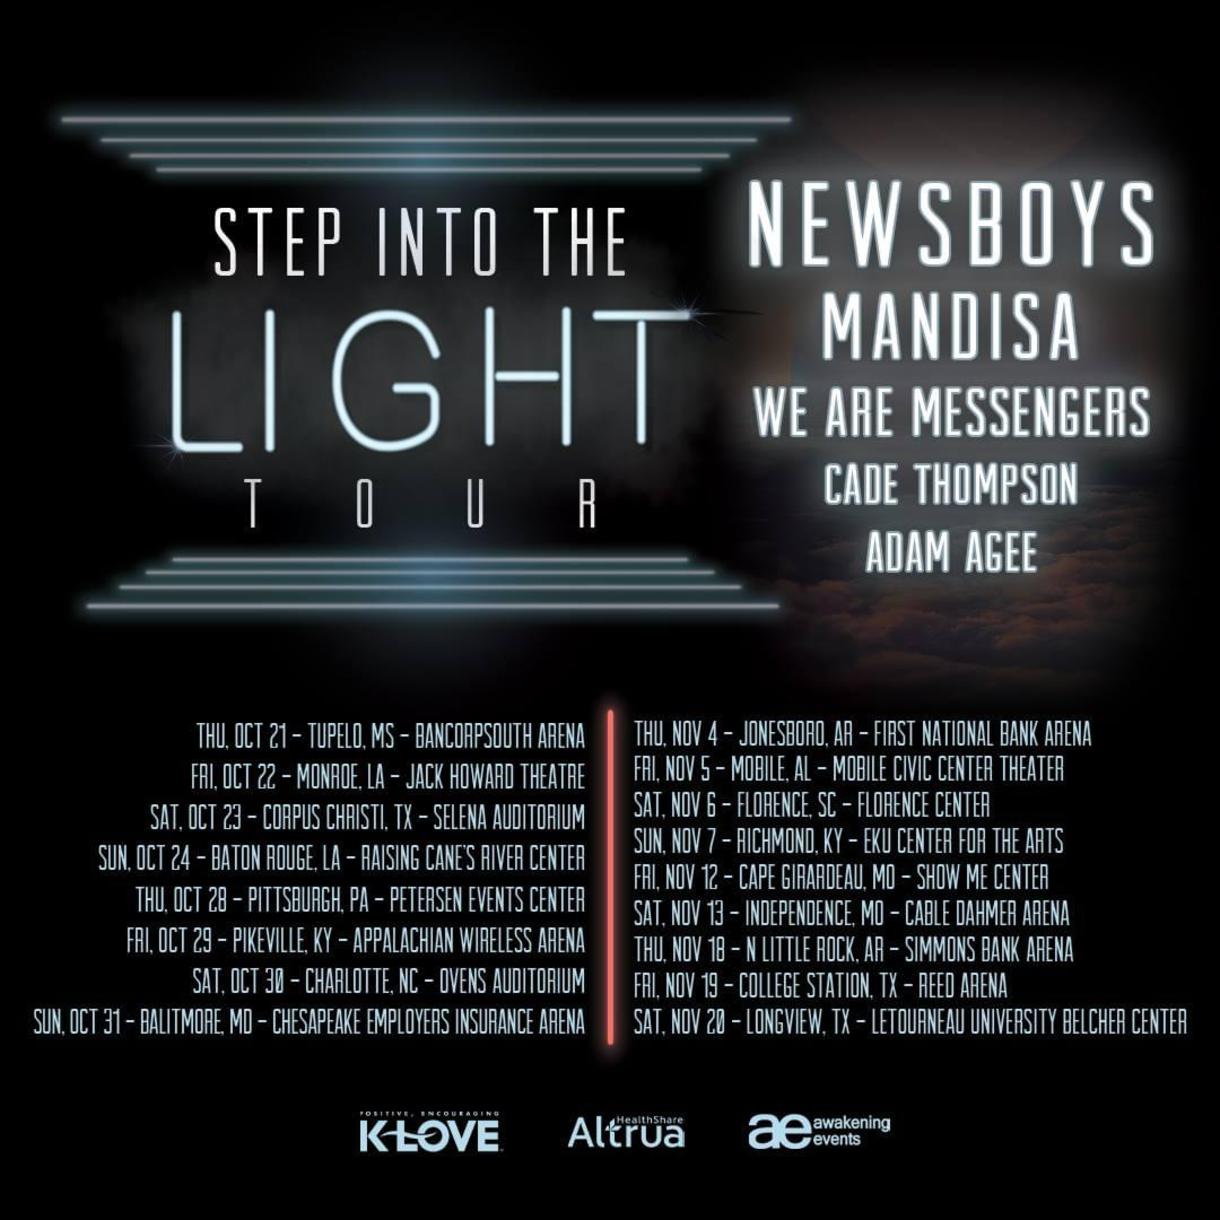 Tour News – Awakening Events Introduces New Multi-Artist Tour